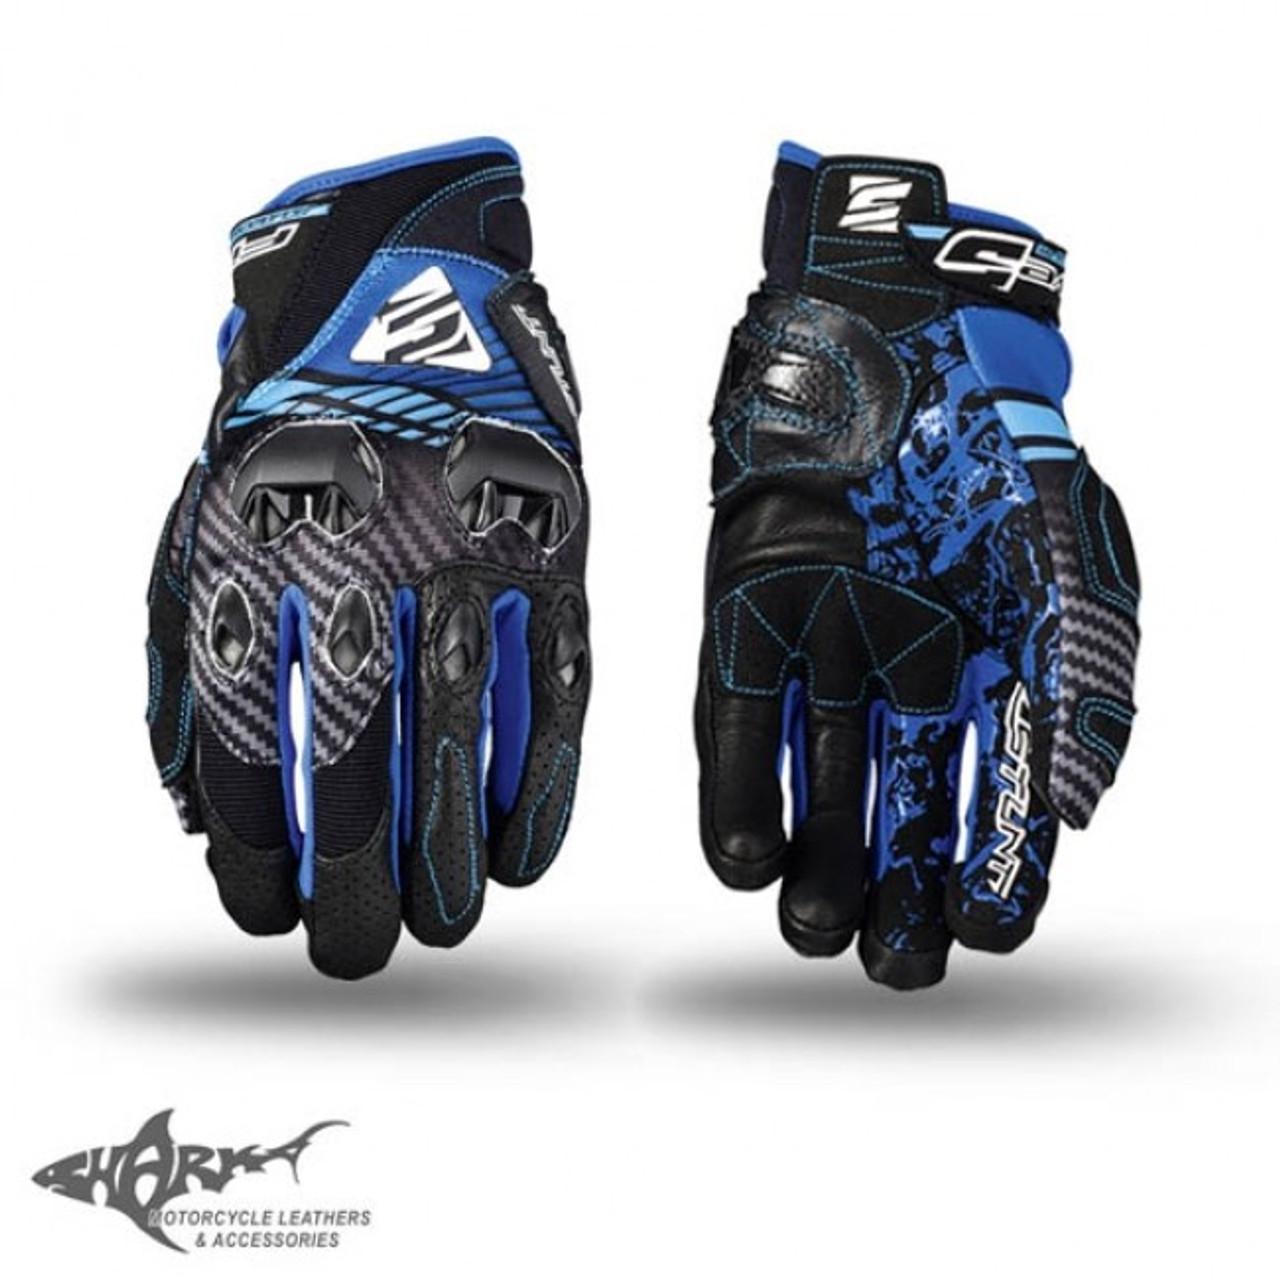 Five Stunt EVO Airflow Road Street Bike Black Leather Vented Motorcycle Gloves